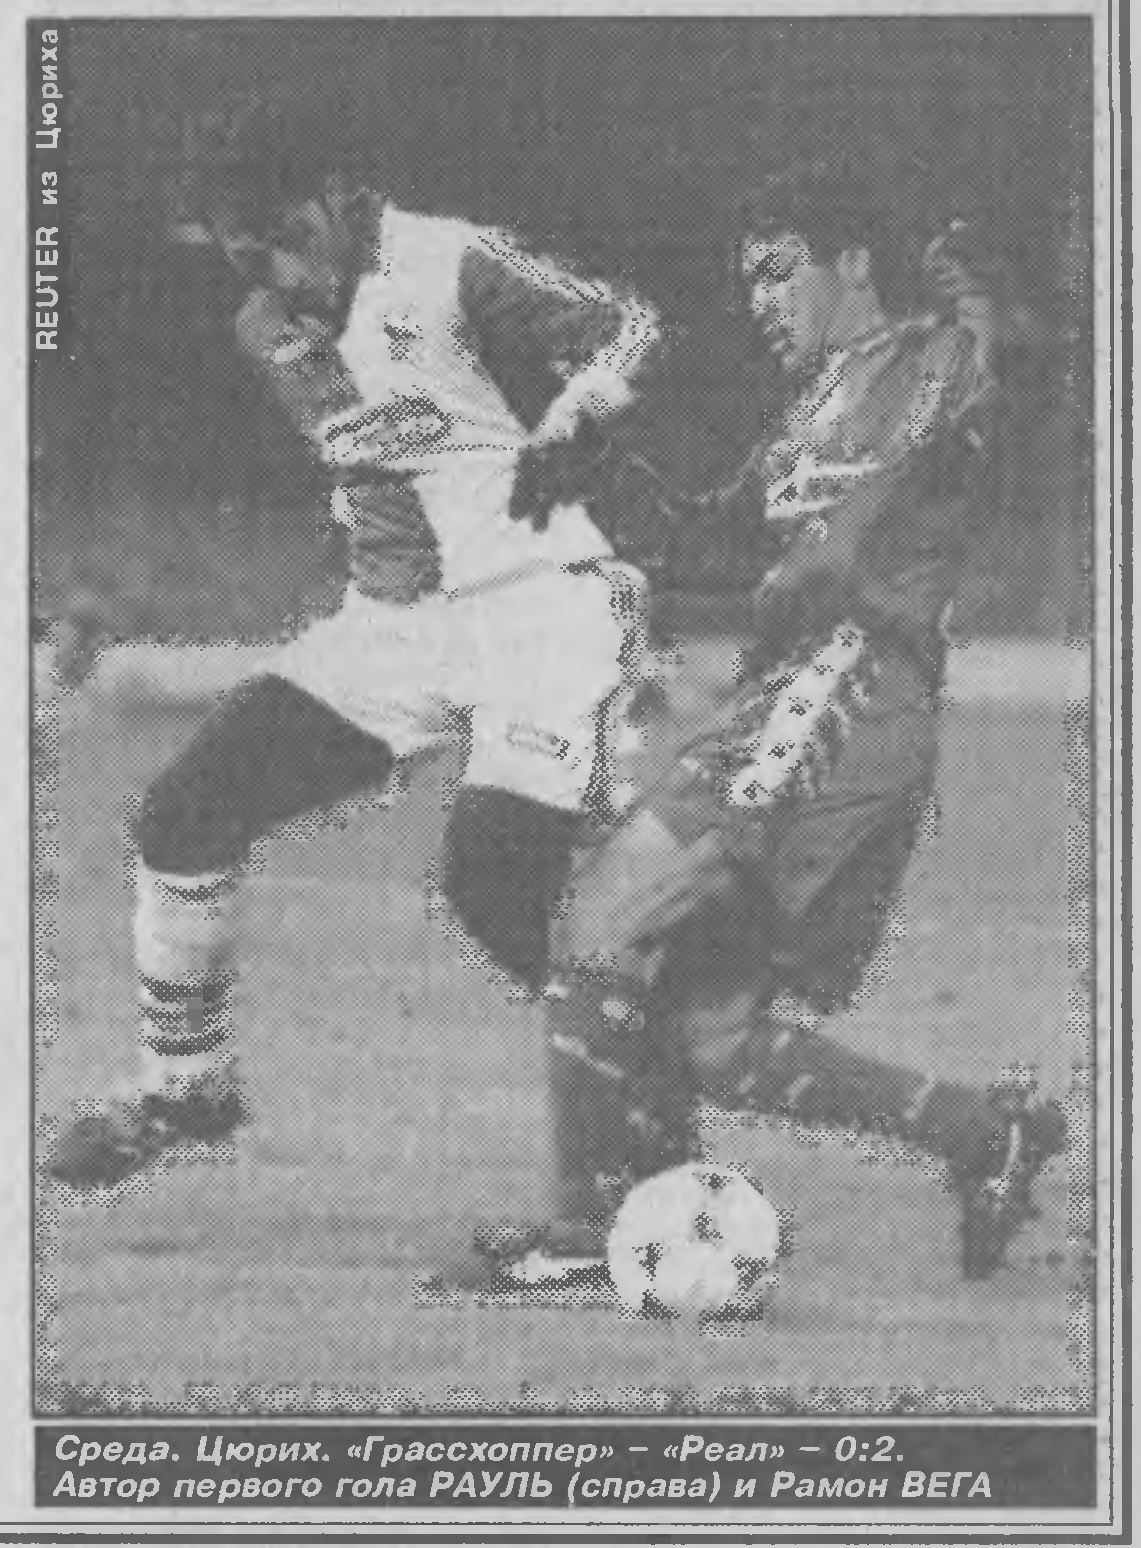 Грассхоппер (Швейцария) - Реал Мадрид (Испания) 0:2